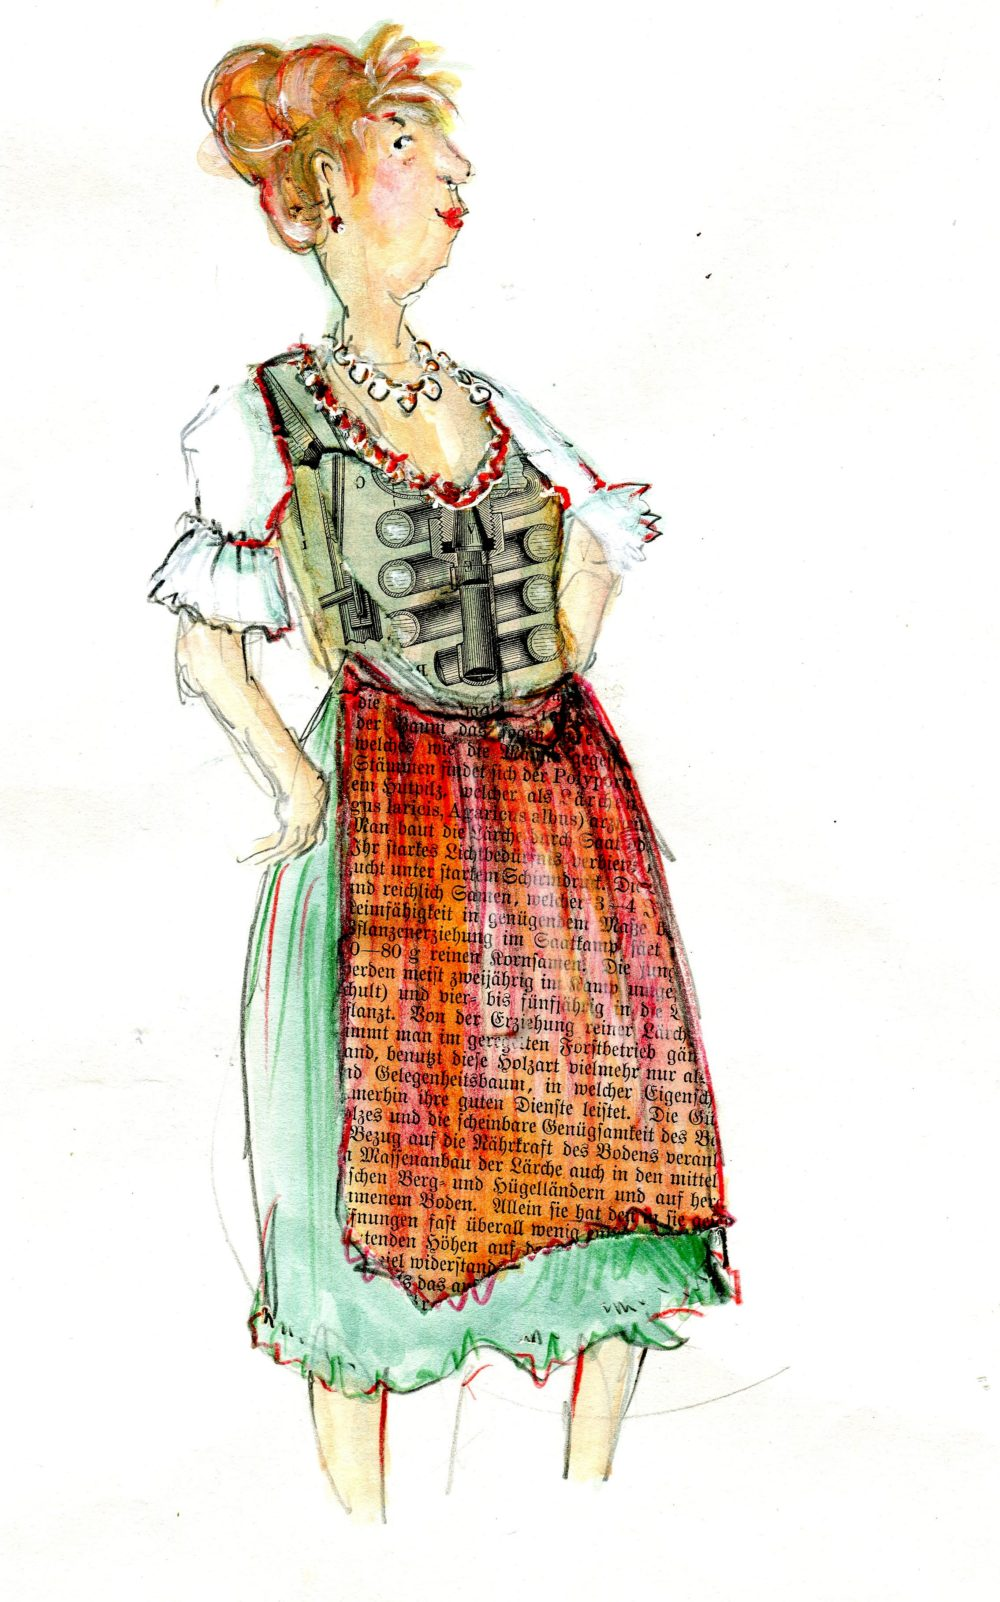 Rosemarie Zacher Werk